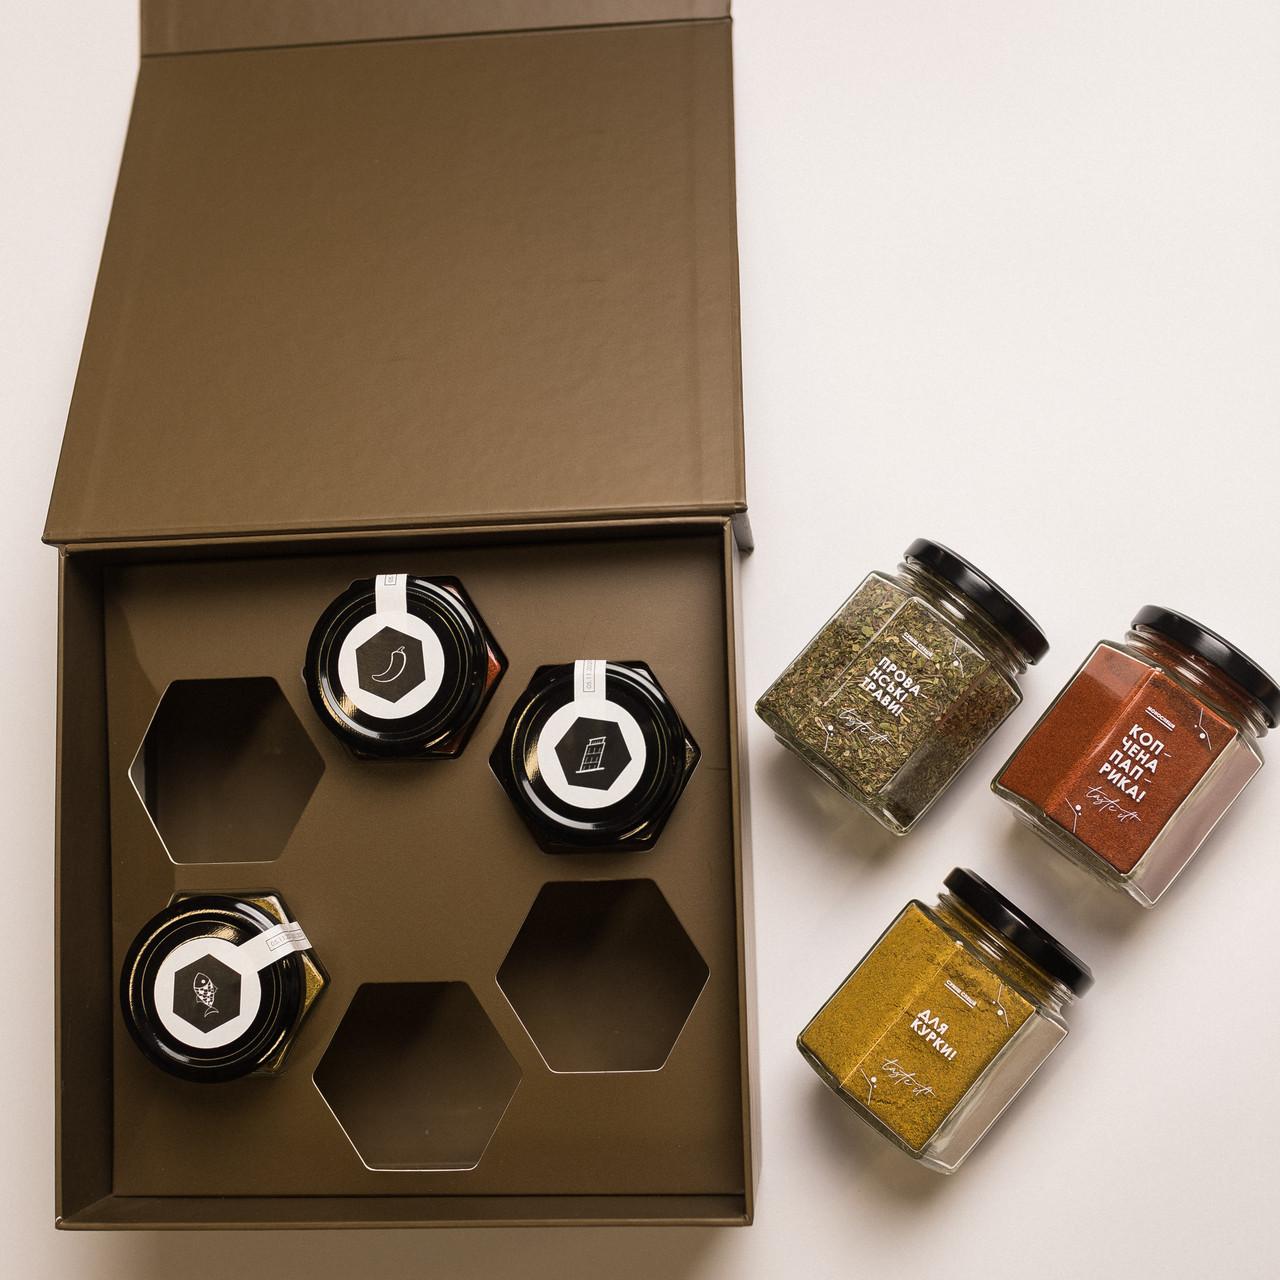 The Spicebox / Премиум Spice 1